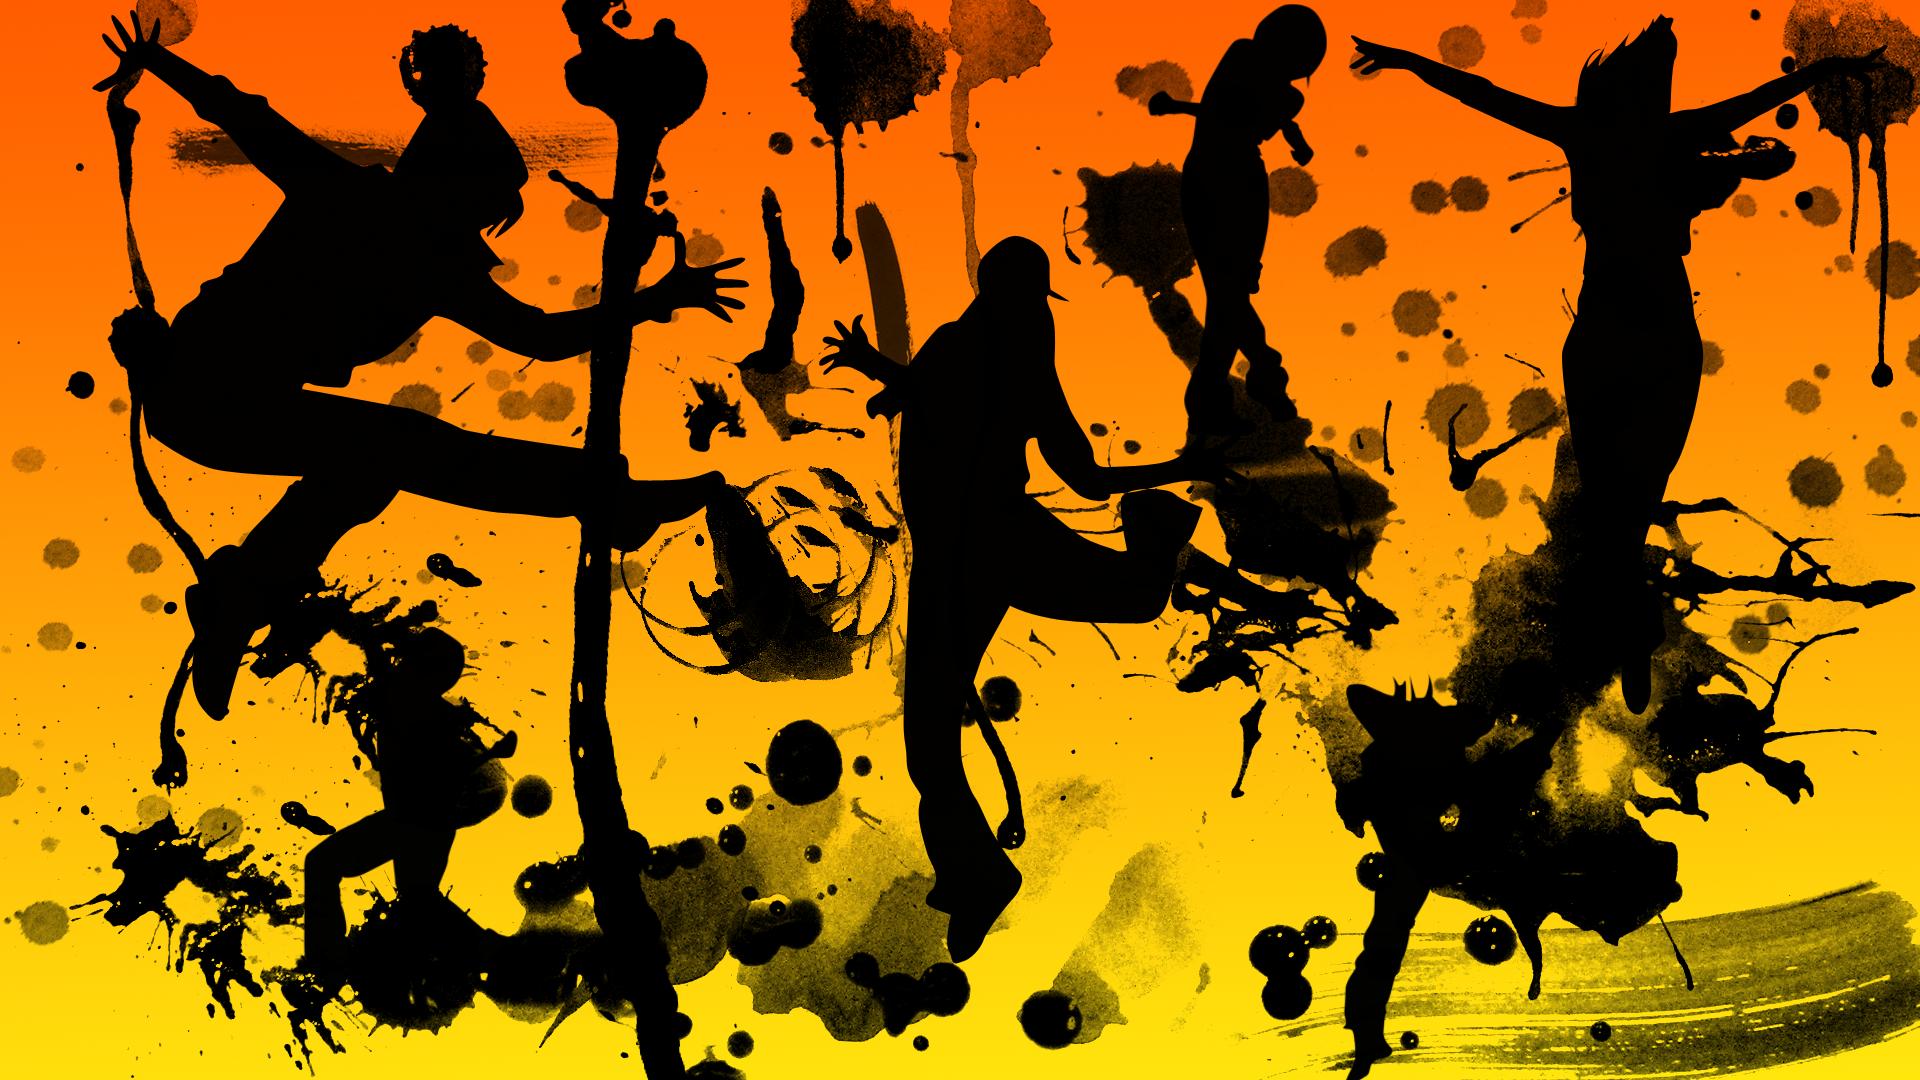 General 1920x1080 Random Access Memories artwork anime silhouette orange yellow black illustration